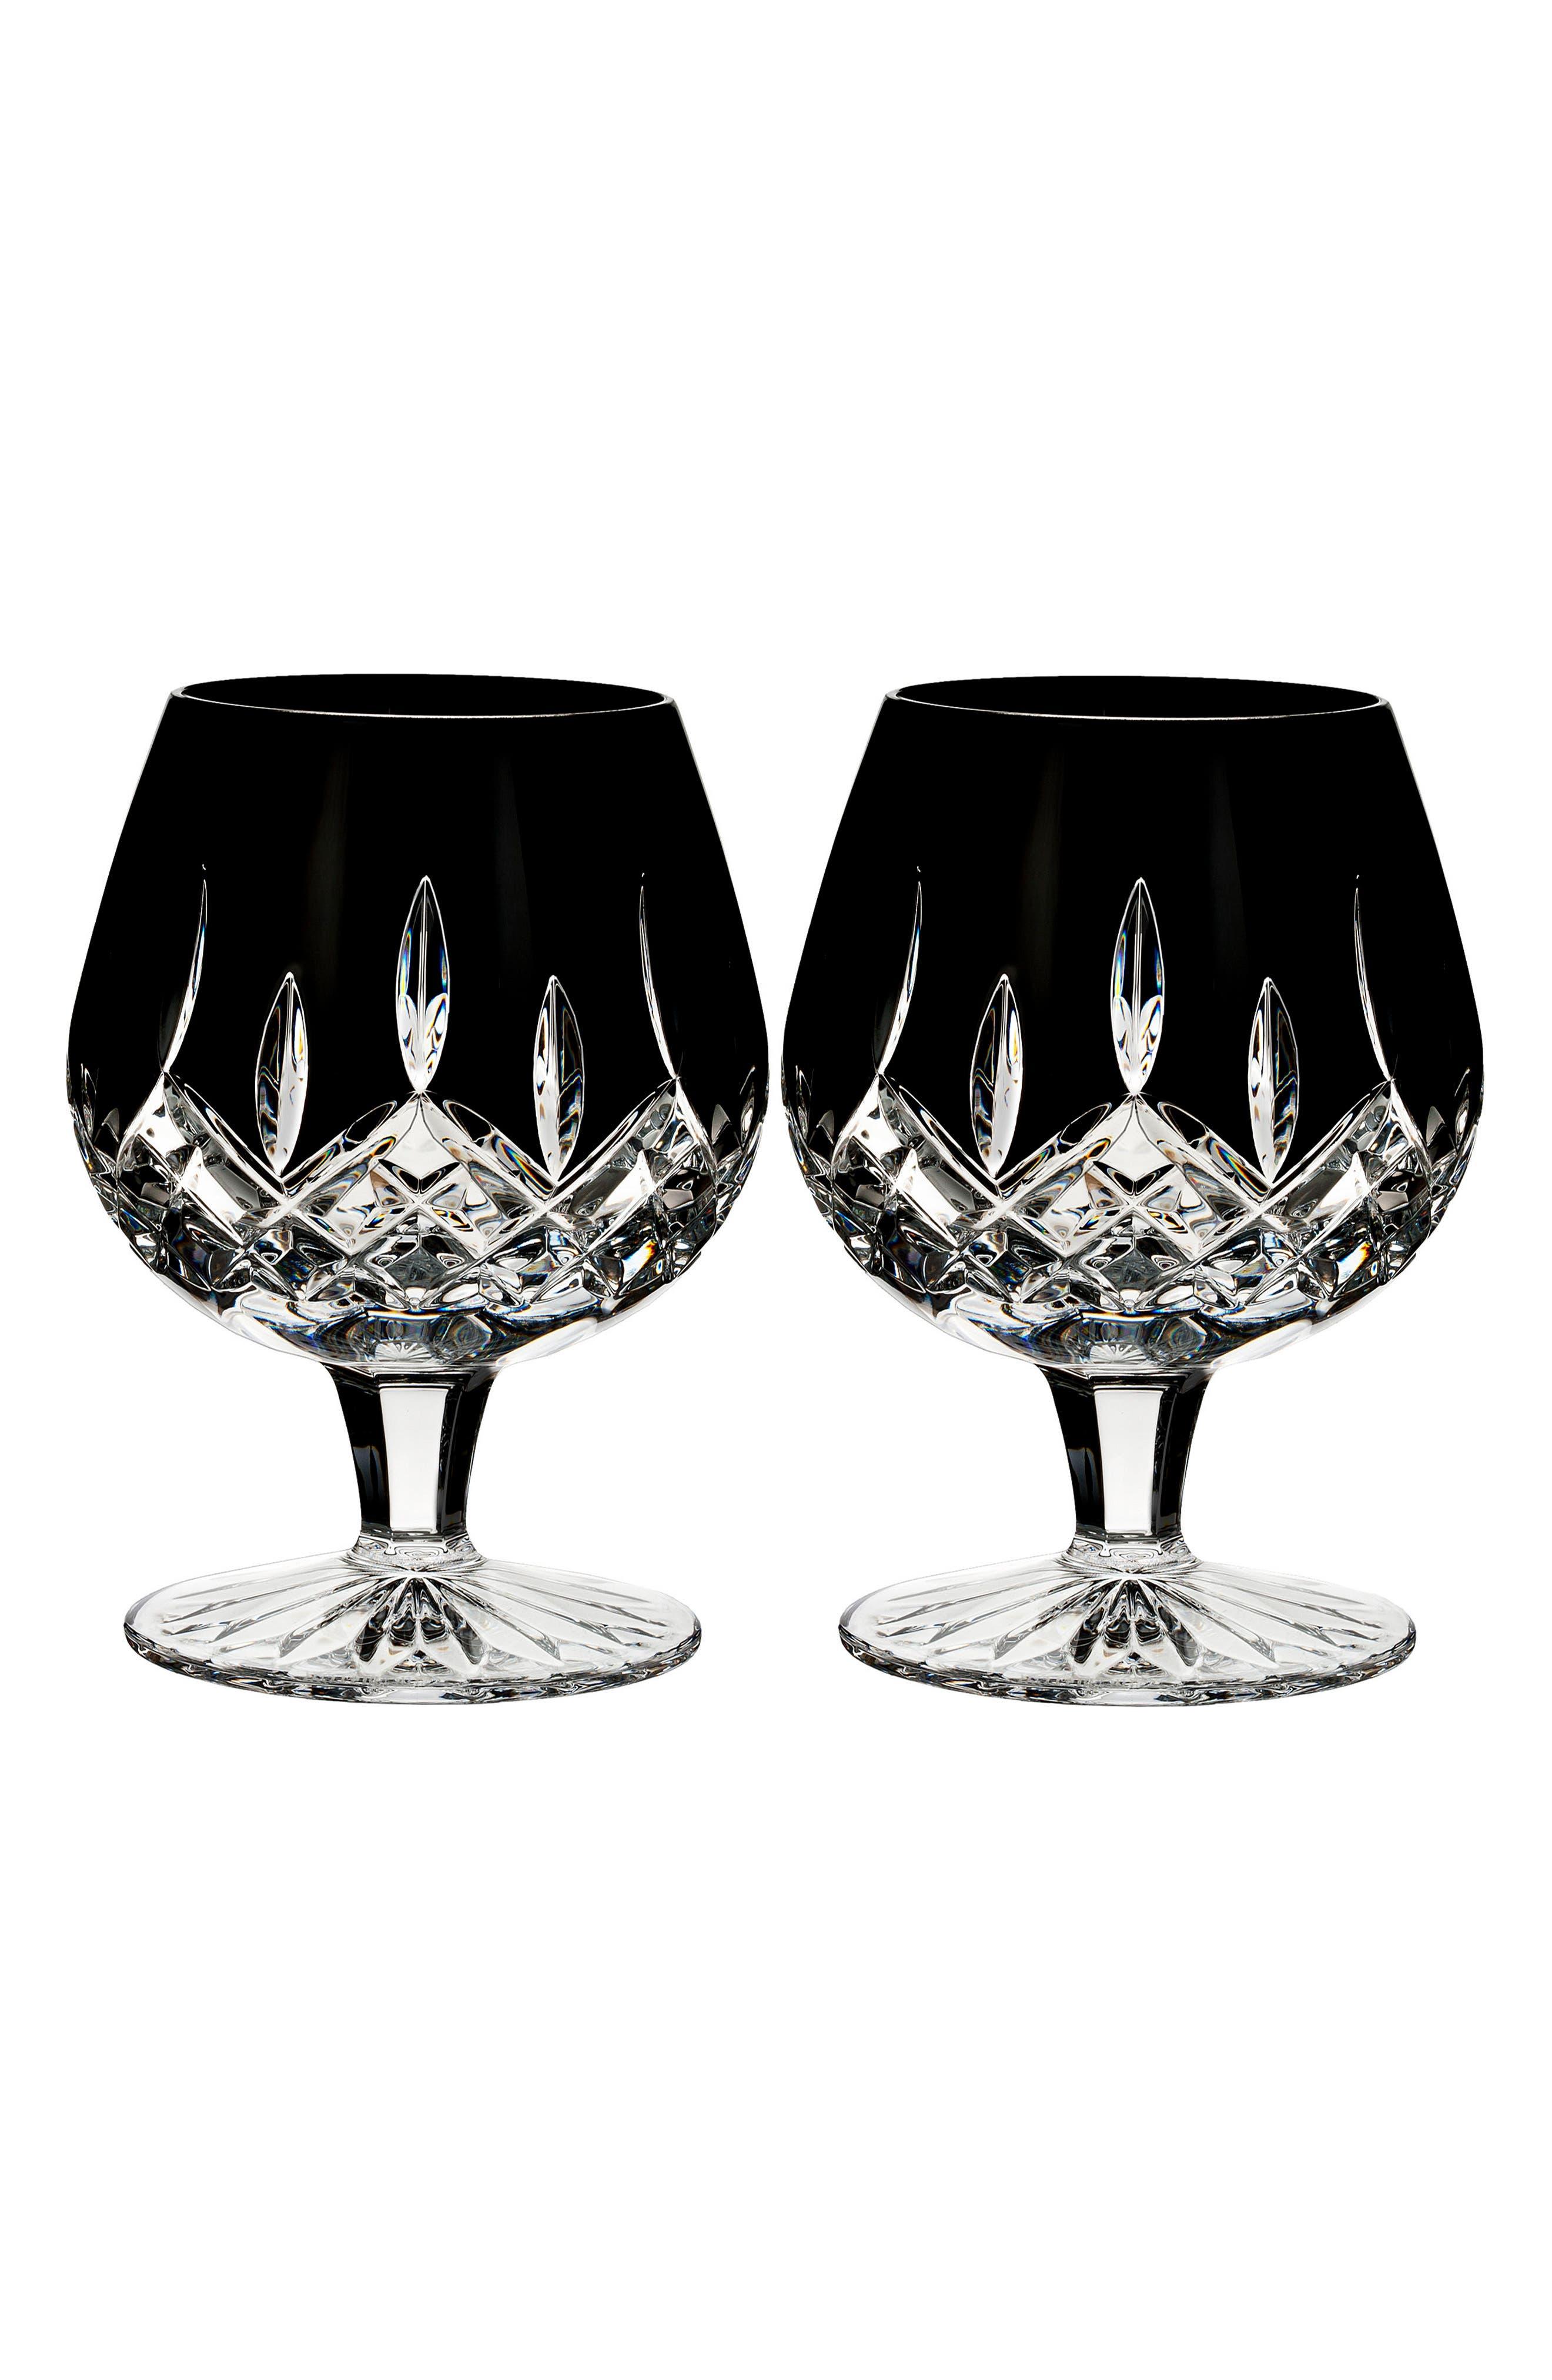 Lismore Diamond Set of 2 Black Lead Crystal Brandy Glasses,                         Main,                         color, Crystal